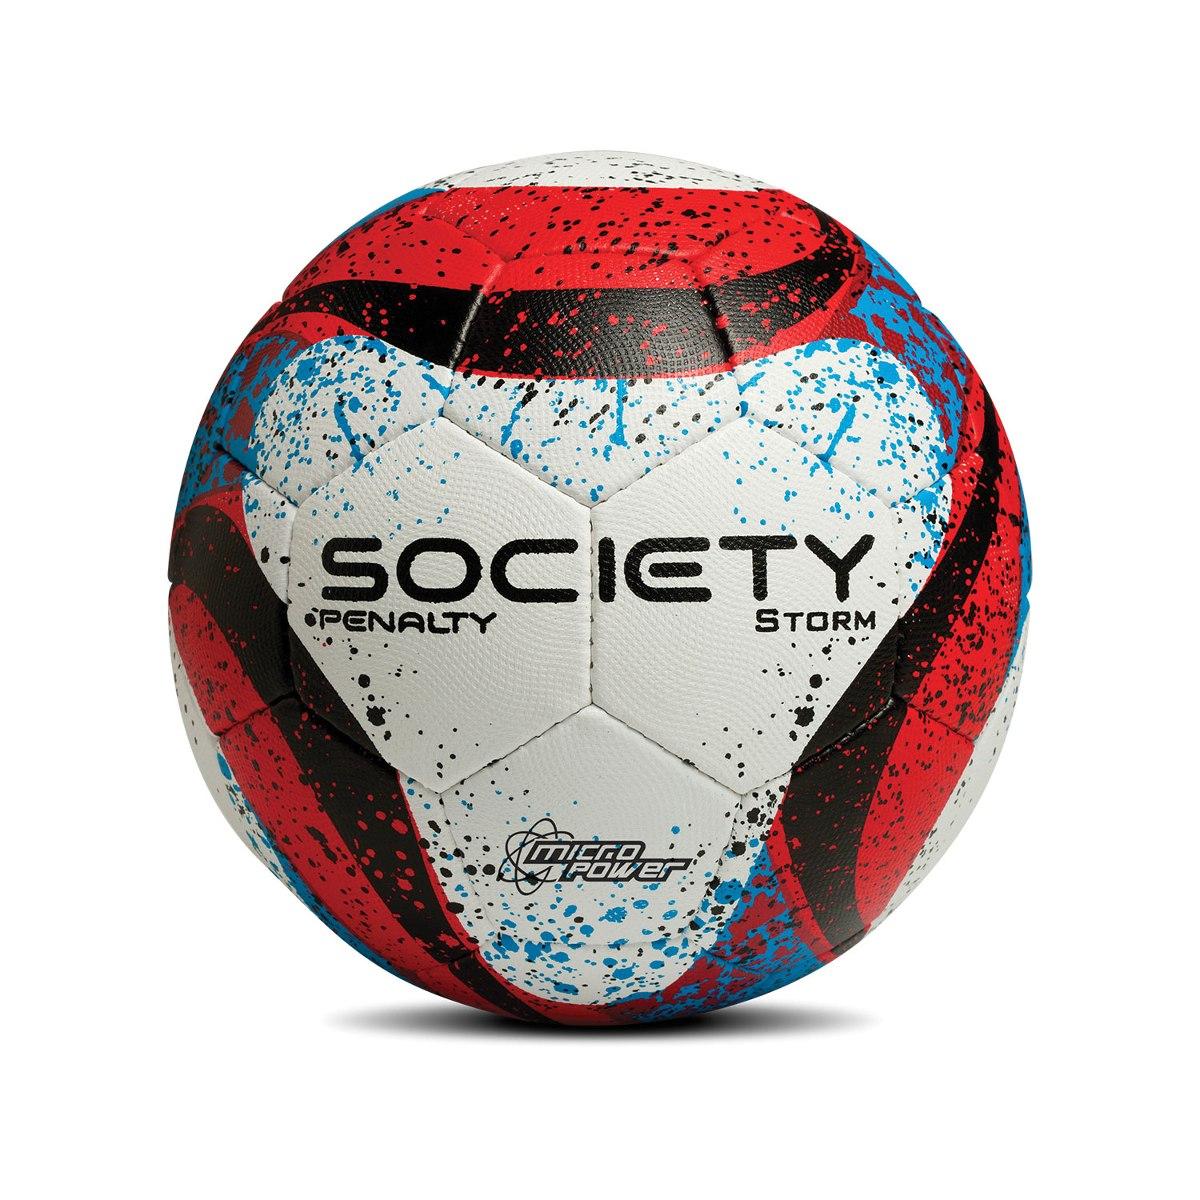 ee4be42b25 Bola De Futebol Society Storm C c - R  115